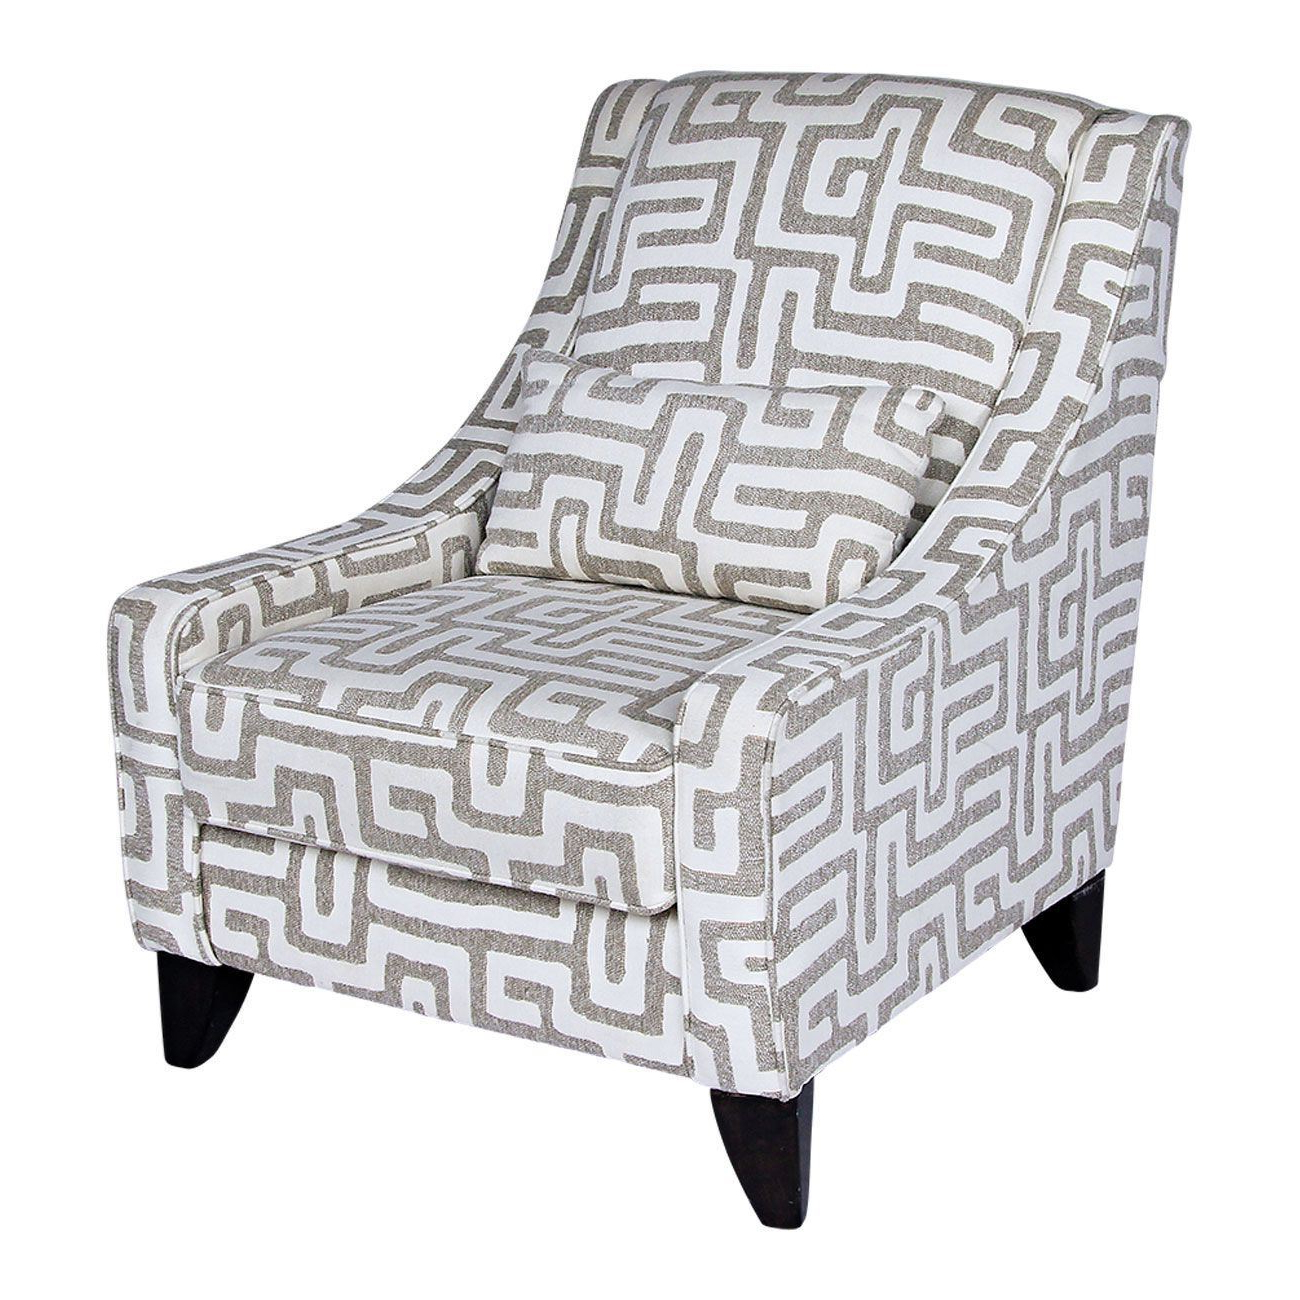 2019 Jaxon Totem Oatmeal Chair – Woodstock Furniture & Mattress Within Jaxon Grey Sideboards (View 8 of 20)